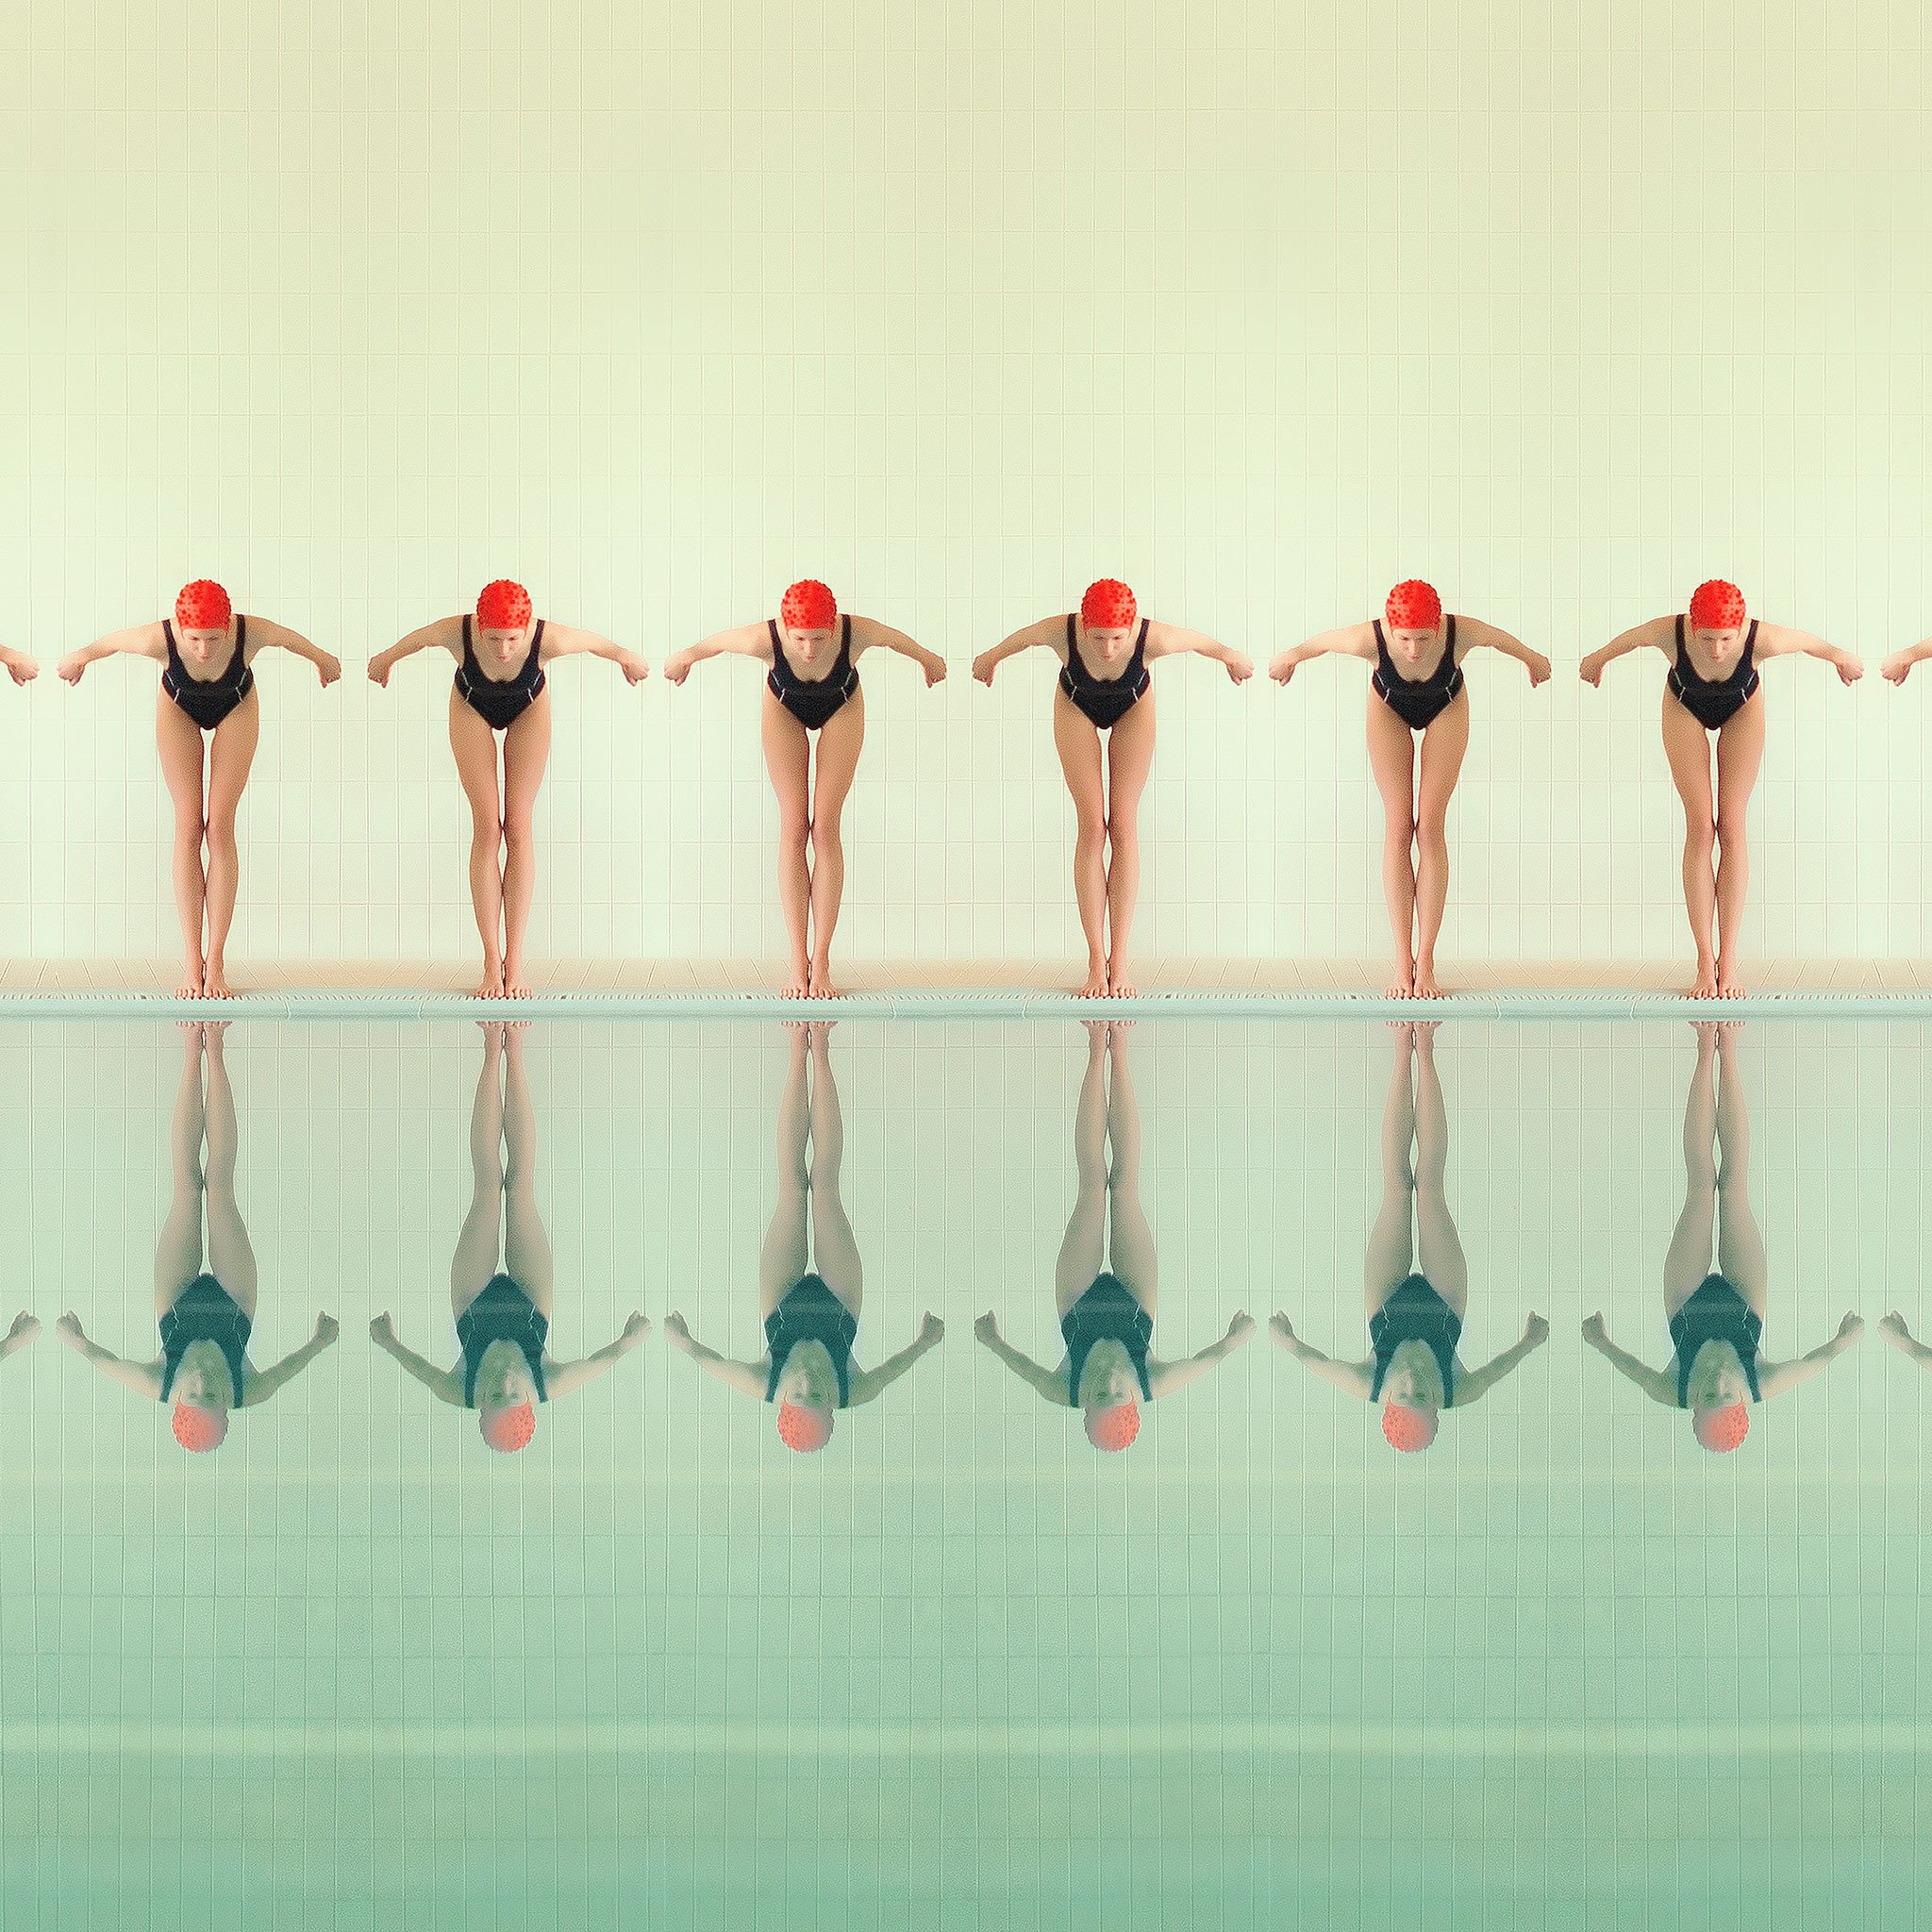 Maria Svarbova. Jump 4 (6), 2017. Sedes invitadas a PHotoESPAÑA 2018. Fotografía © Maria Svarbova